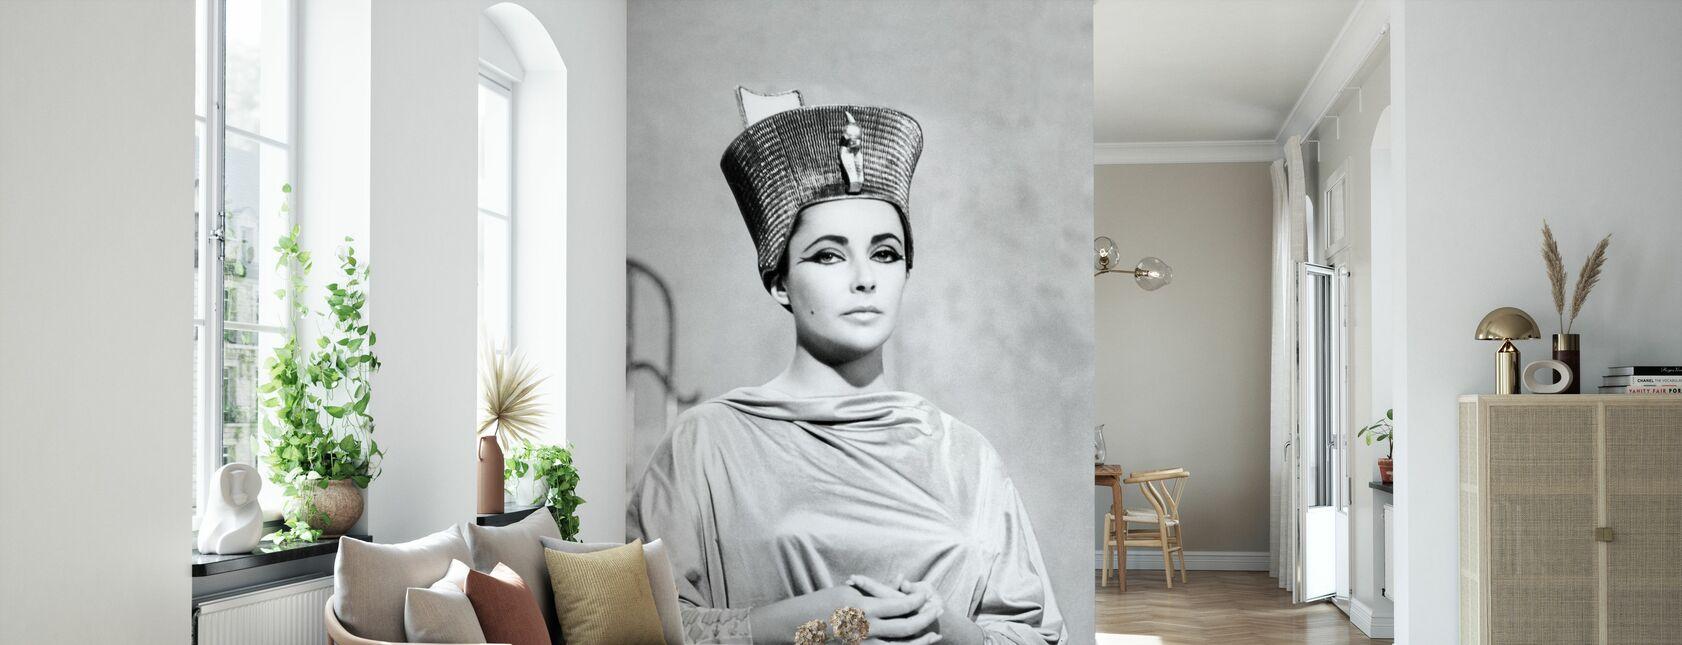 Kleopatran - Tapetti - Olohuone